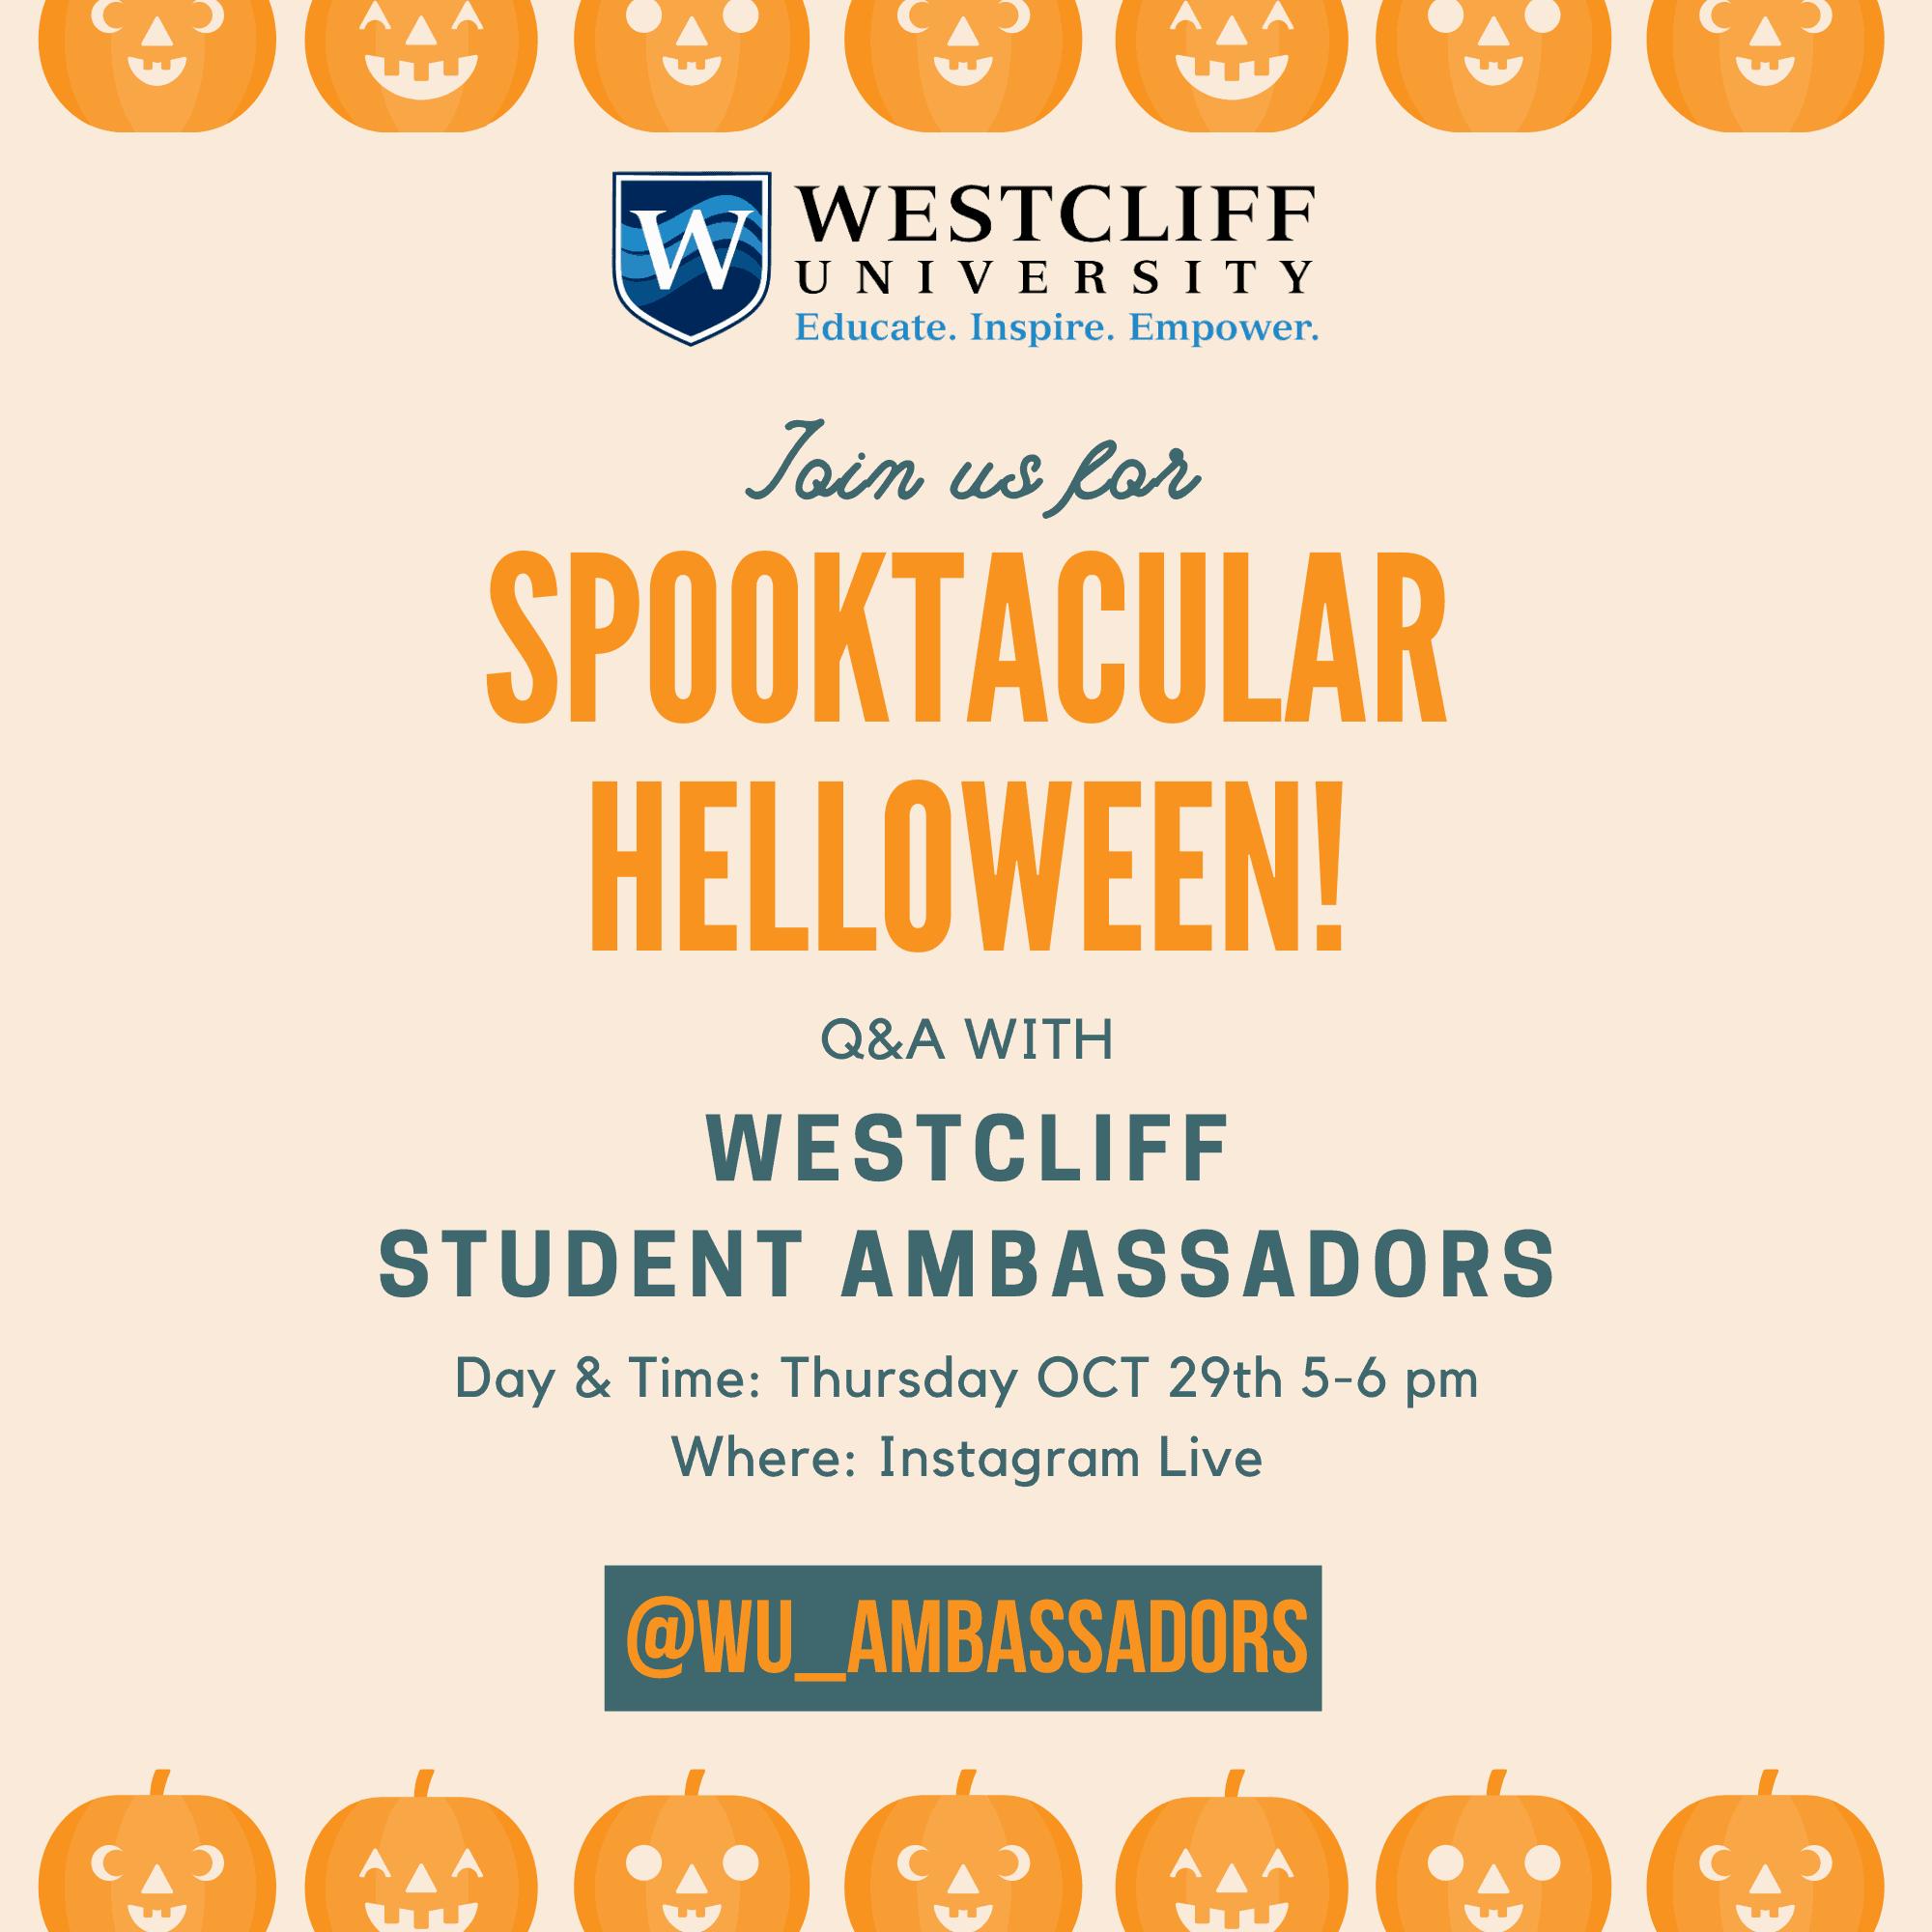 image of student ambassador event for westcliff university